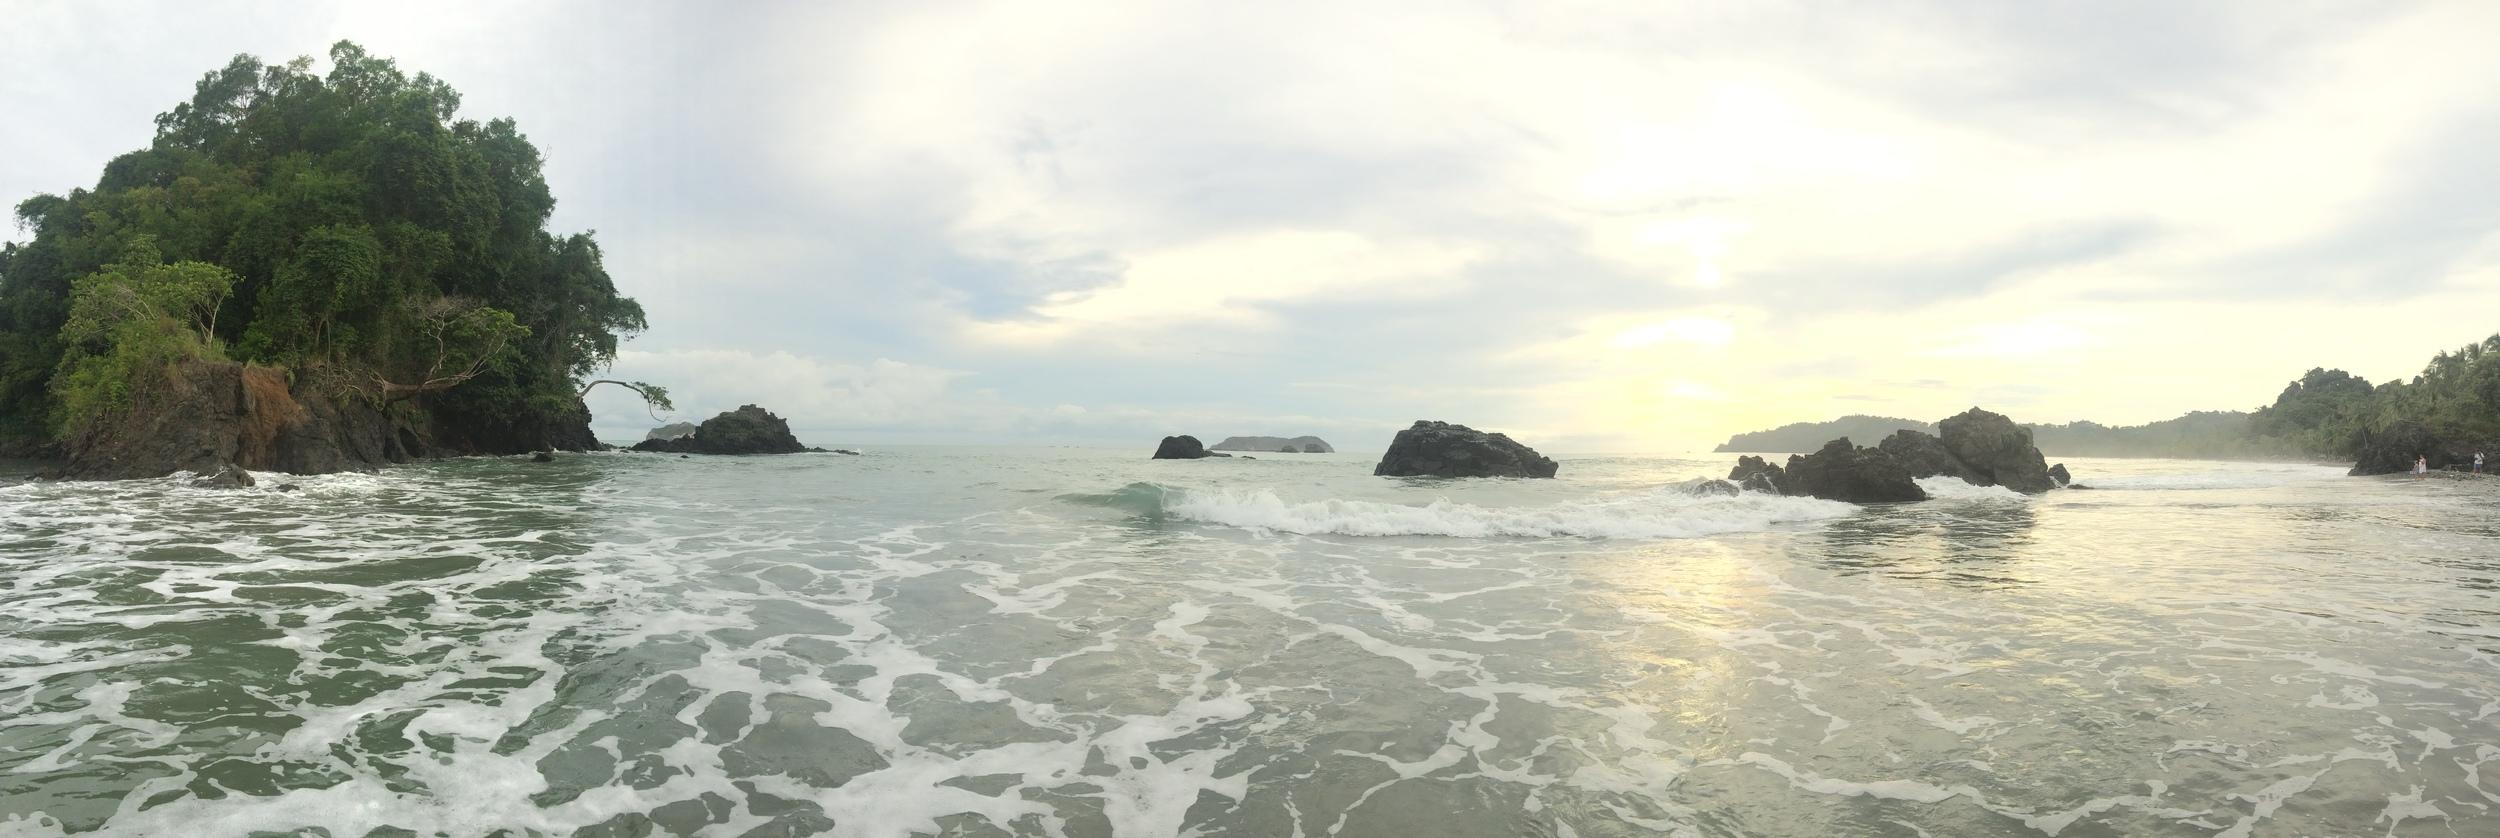 Playa Espadilla, Manuel Antonio National Park